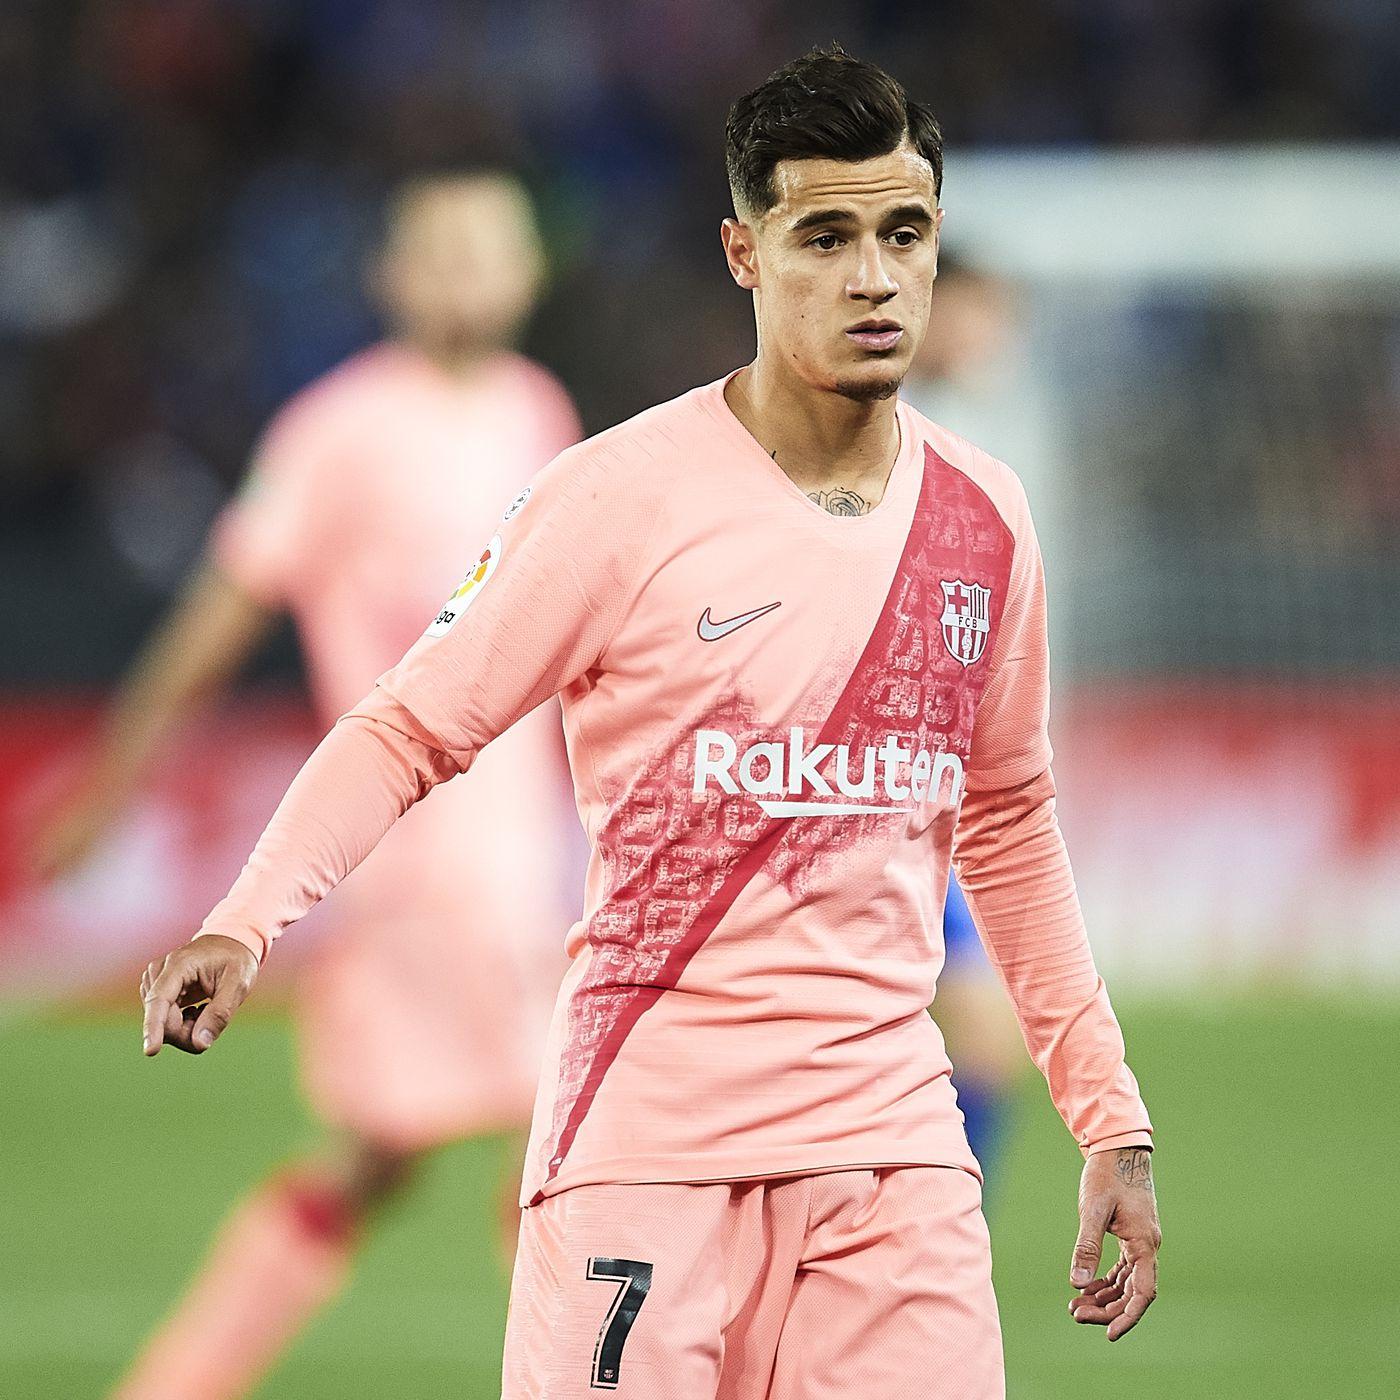 Fc Barcelona News 25 June 2019 Neymar Transfer Inches Closer Philippe Coutinho Admits To Unsure Future Barca Blaugranes